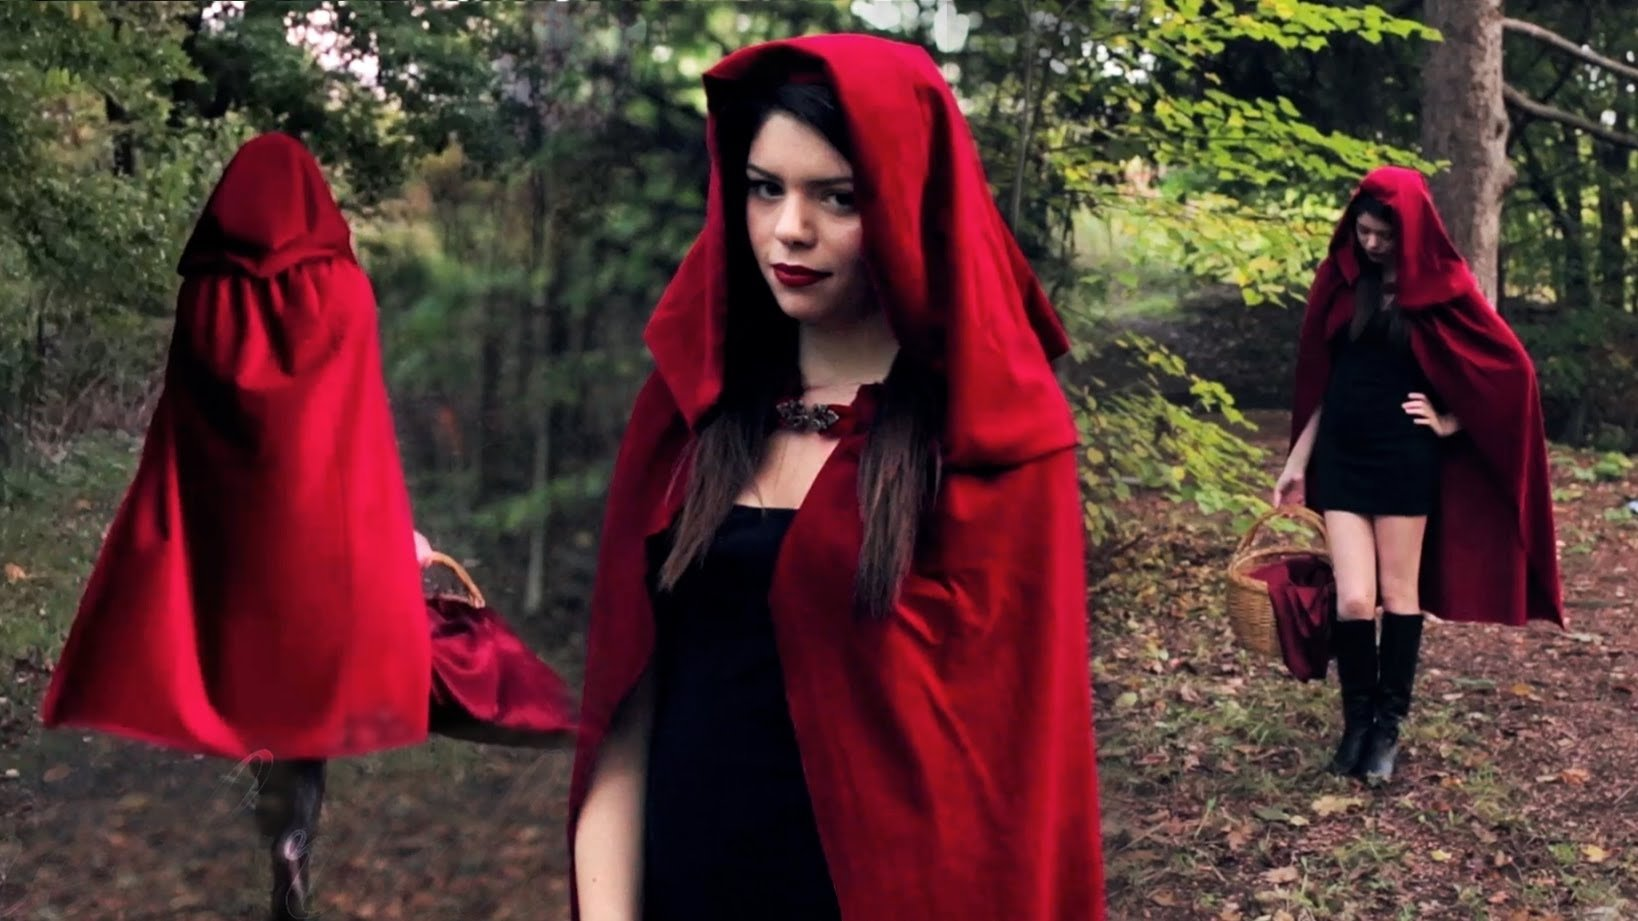 10 Trendy Red Riding Hood Costume Ideas diy little red riding hood costume youtube 2020